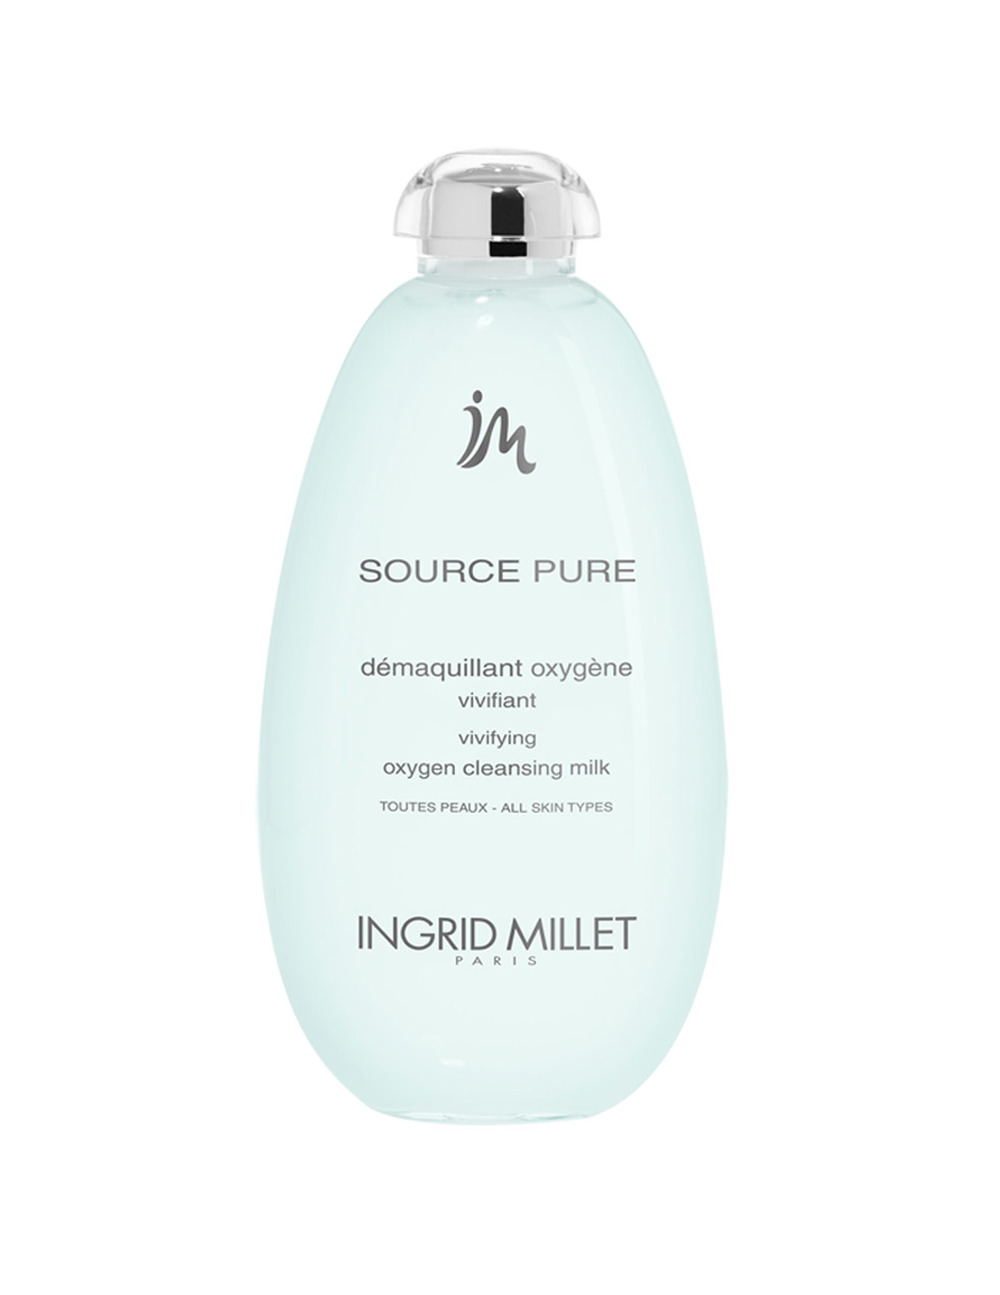 4-Demaquillant-Oxygene-latte-struccante-Ingrid-Millet-Linea-cosmetici-di-lusso-Source-Pure-Dispar-SpA.jpg